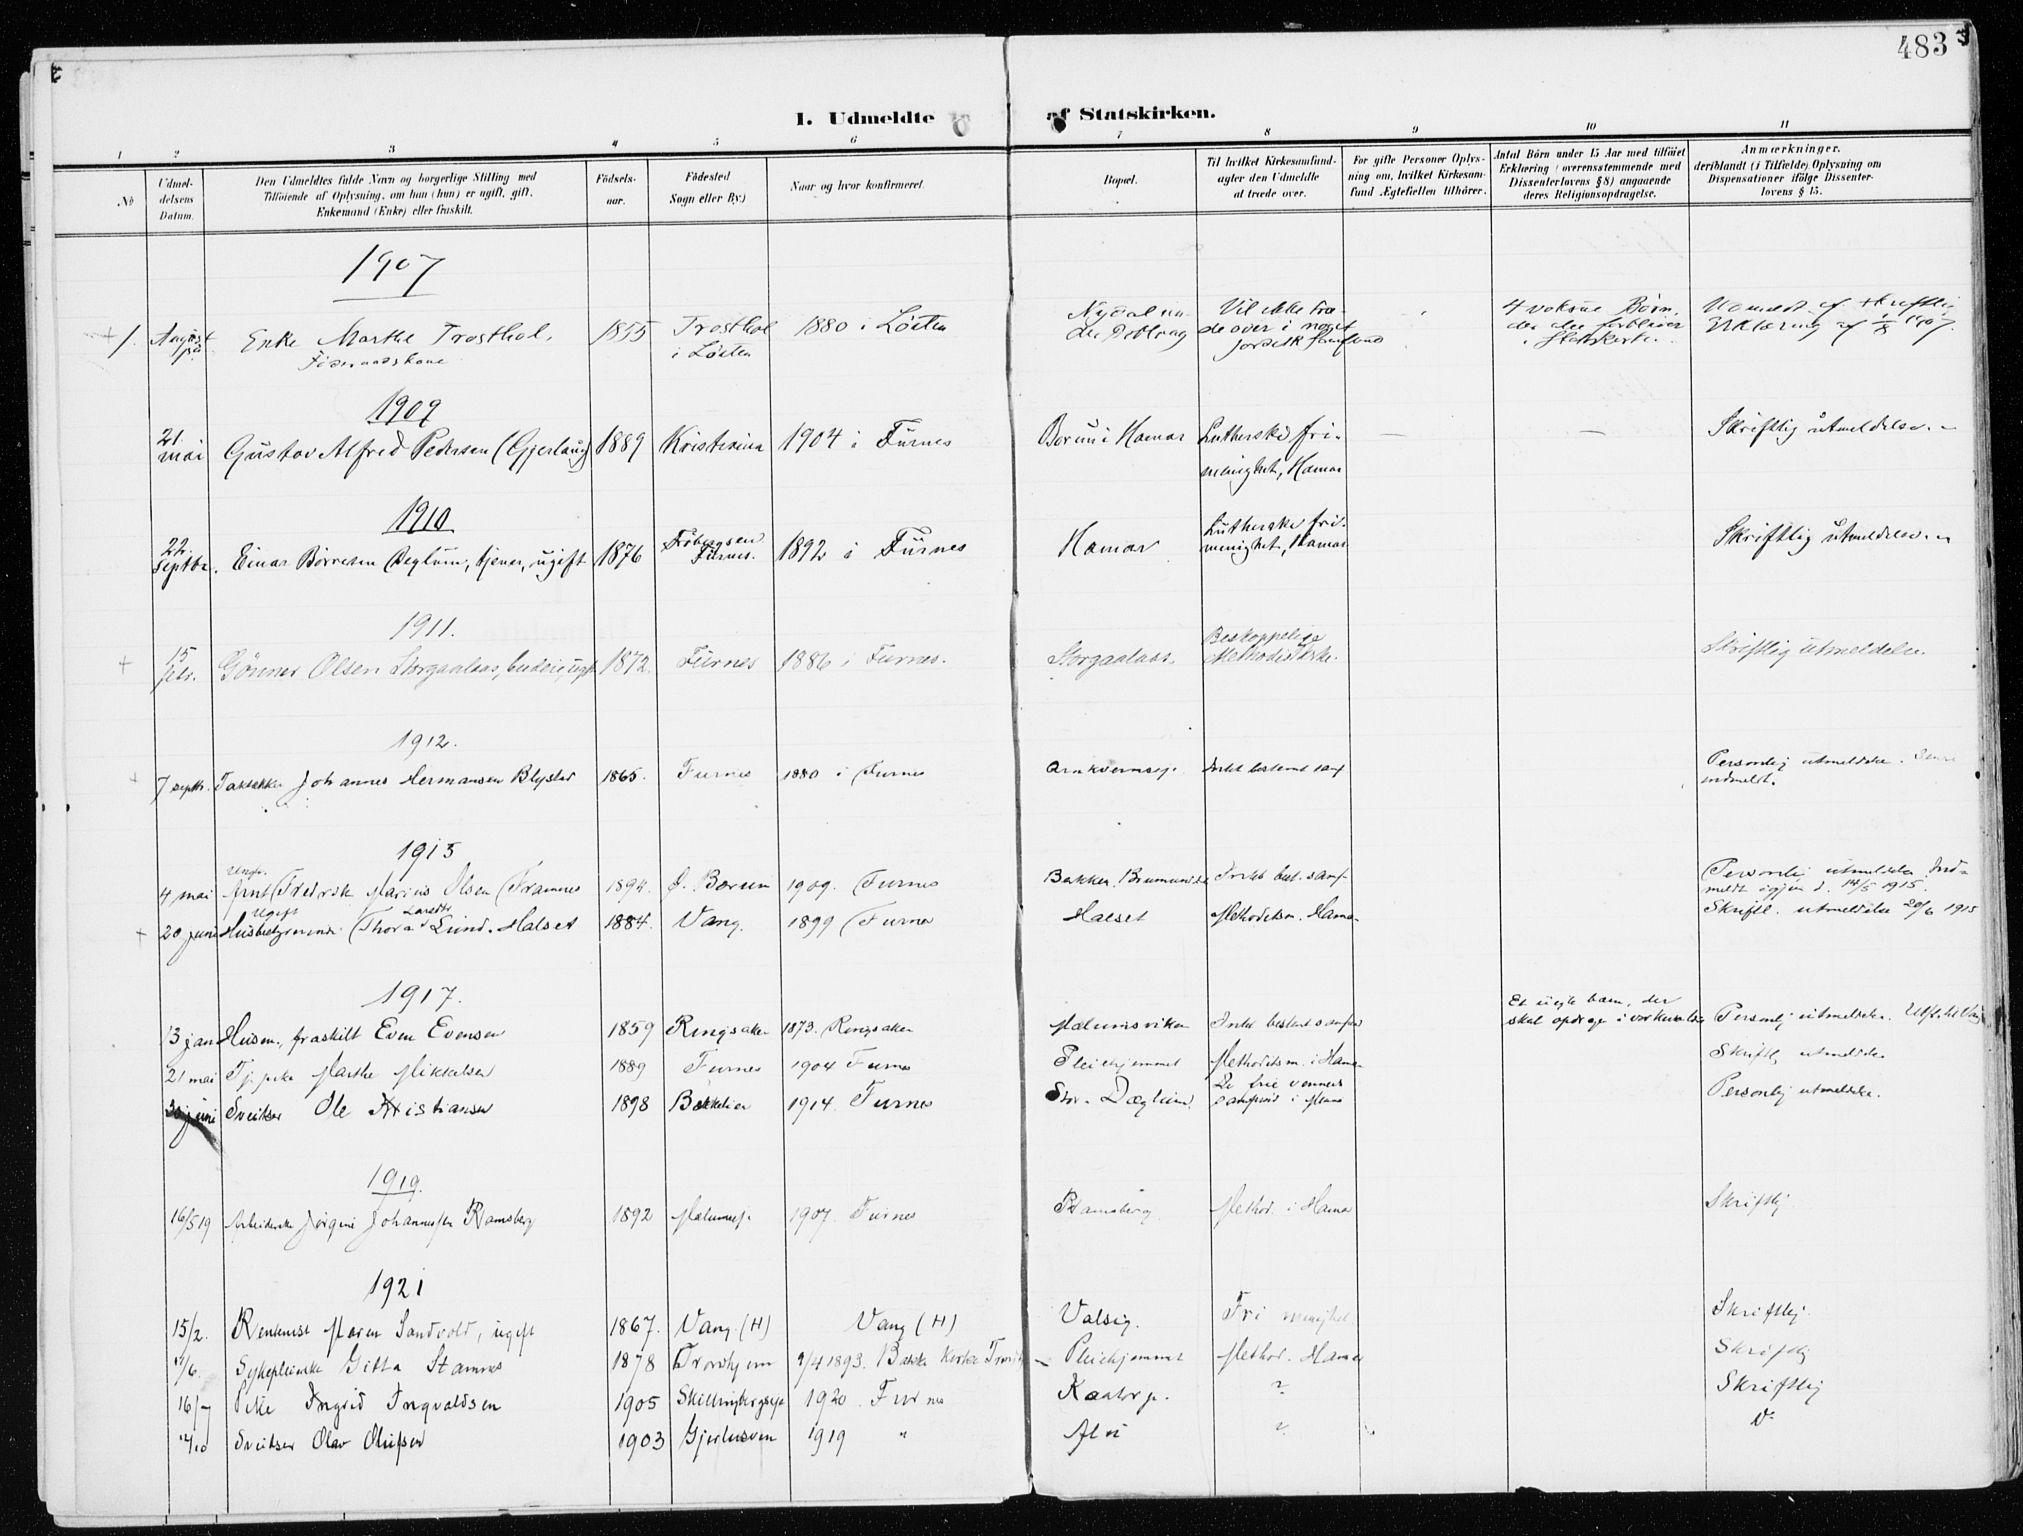 SAH, Furnes prestekontor, K/Ka/L0001: Ministerialbok nr. 1, 1907-1935, s. 483